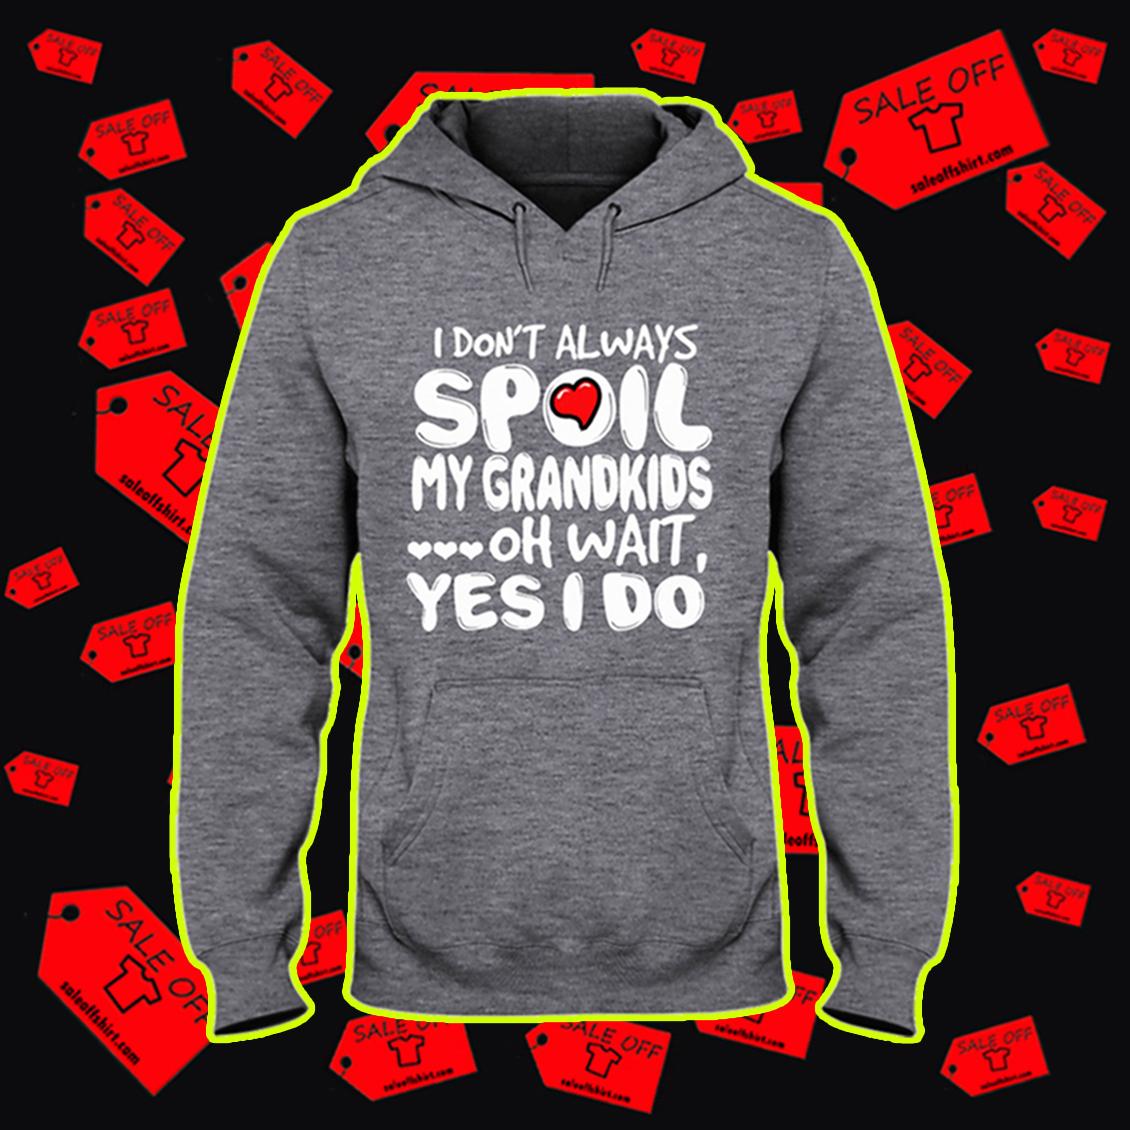 I don't always spoil my grandkids oh wait yes I do hooded sweatshirt